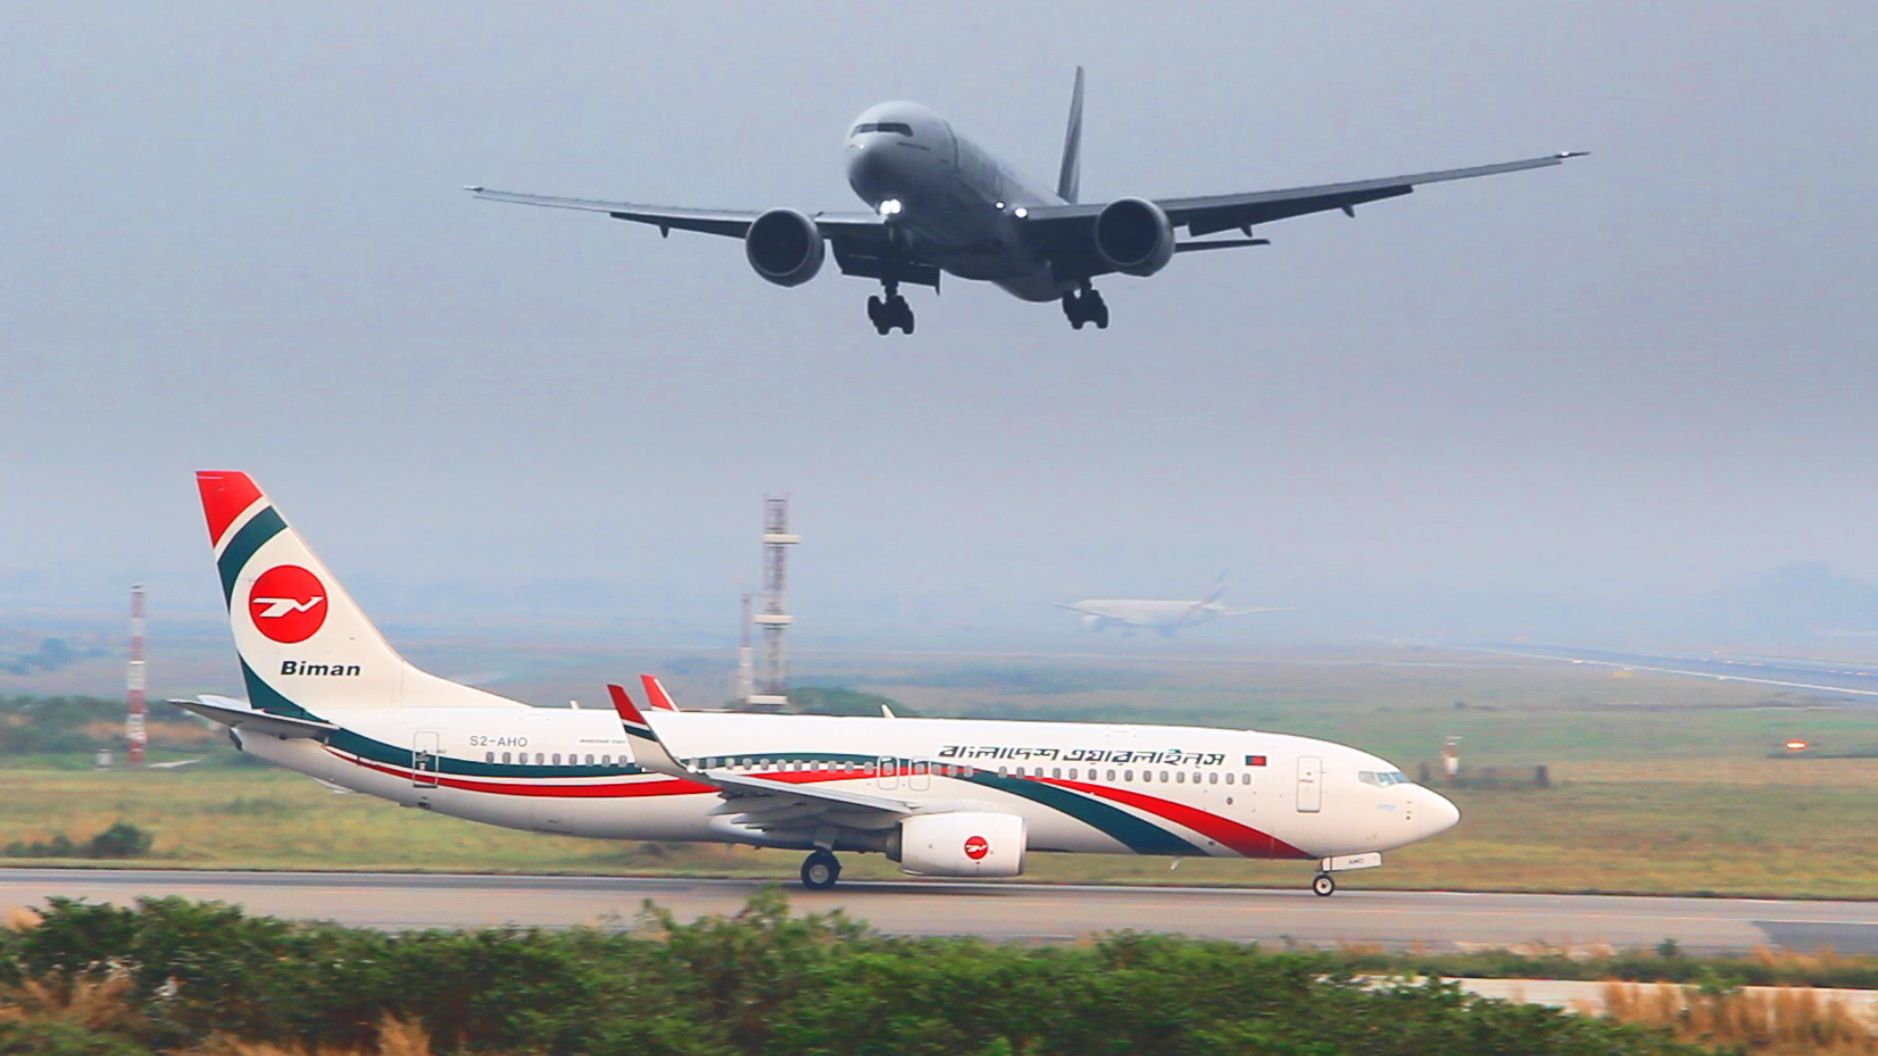 Airplane Landing And Takeoff At Dhaka Airport Aeroplane Video By